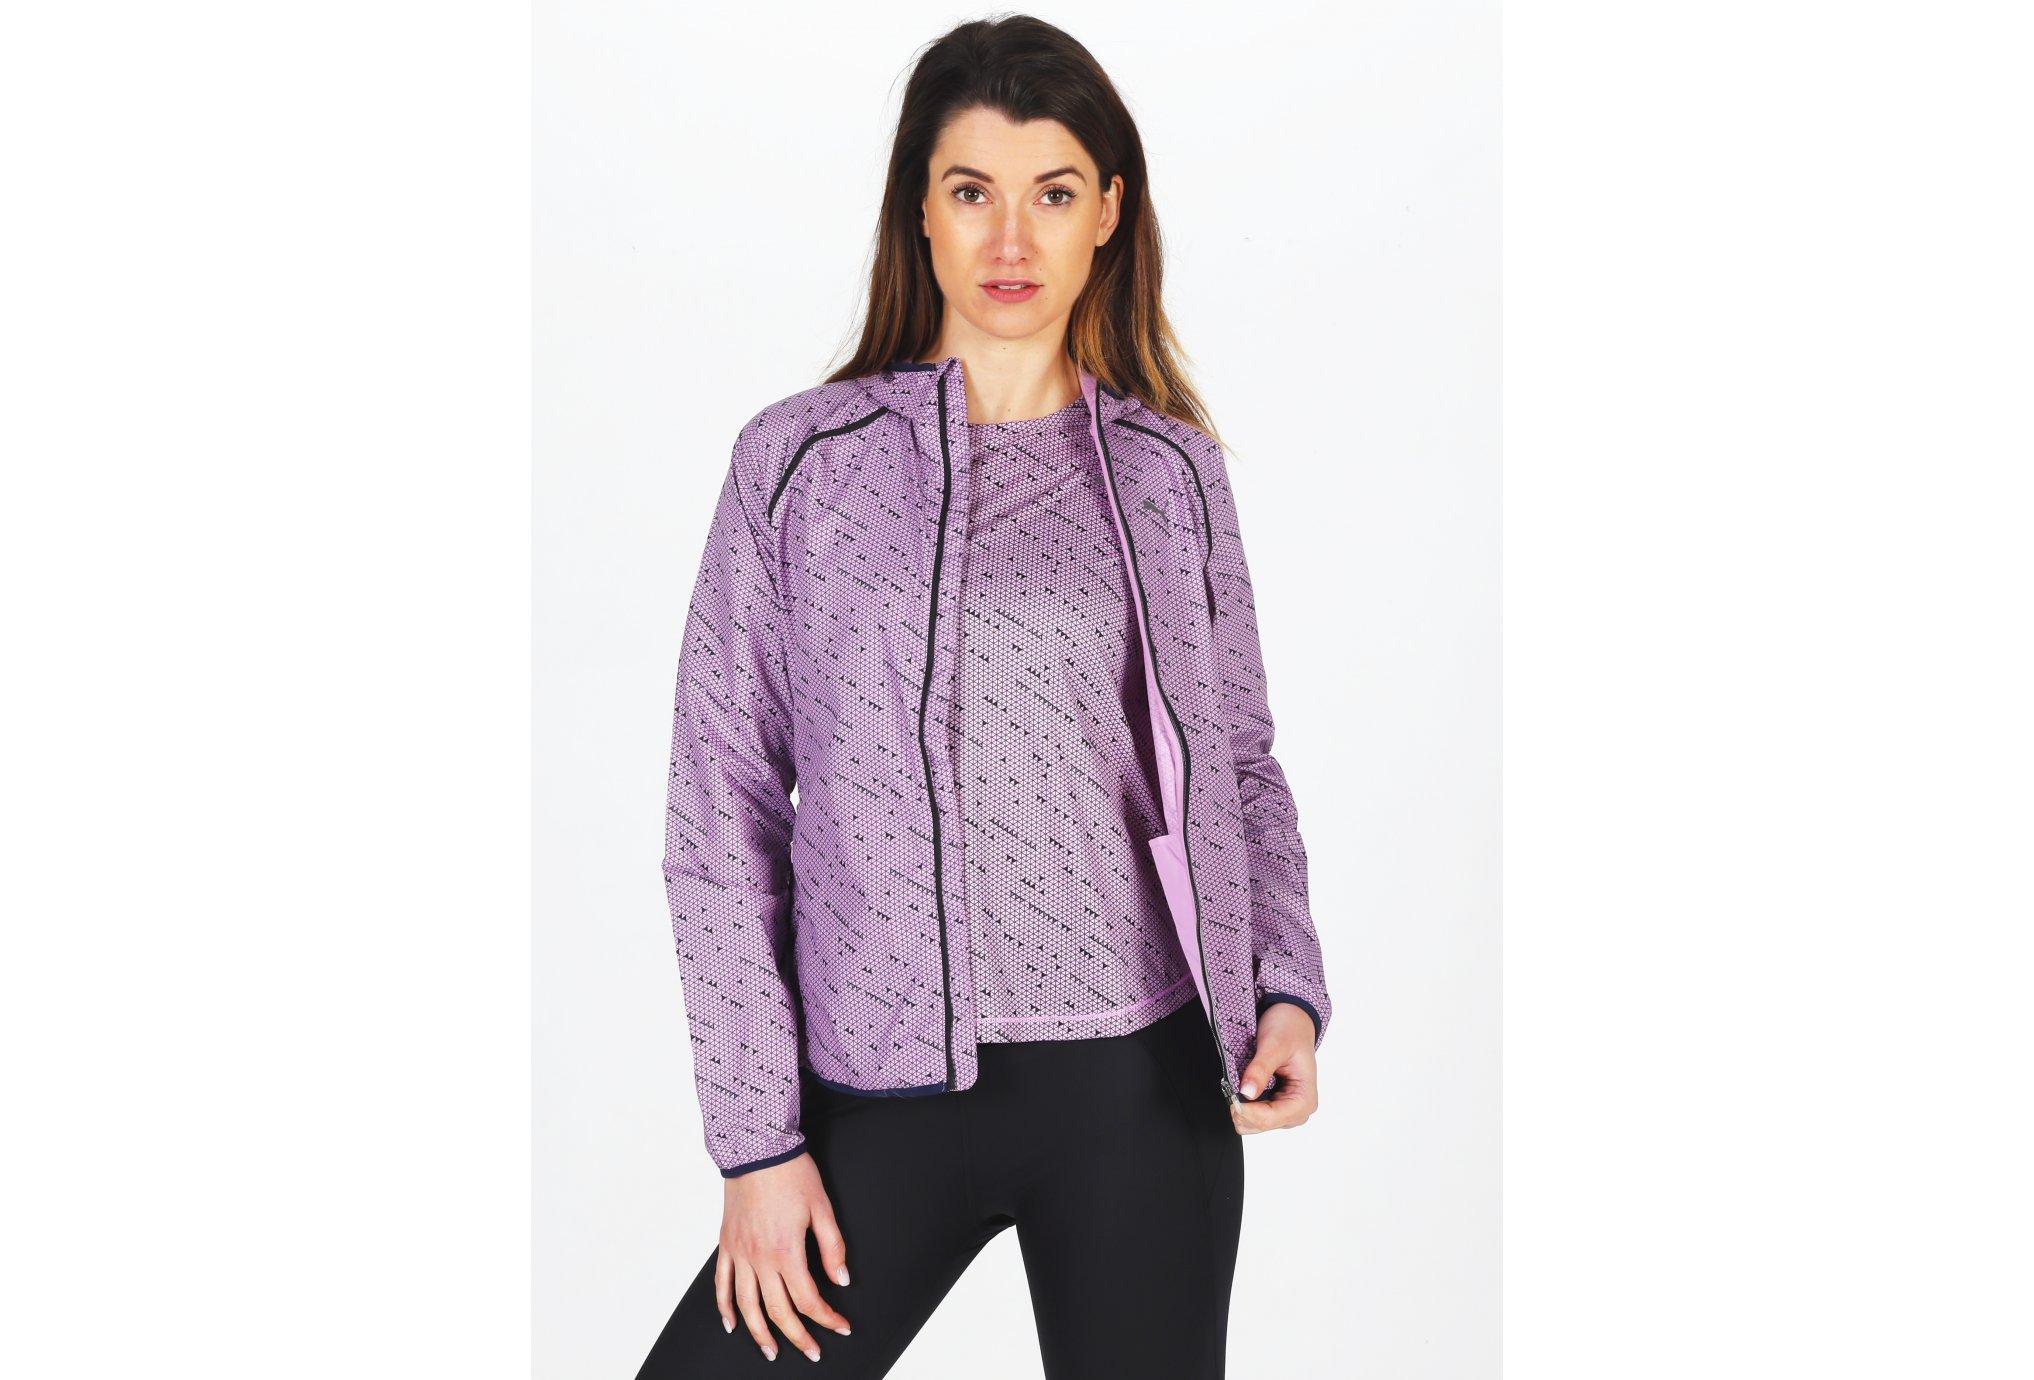 Puma Lastlap Graphic W vêtement running femme